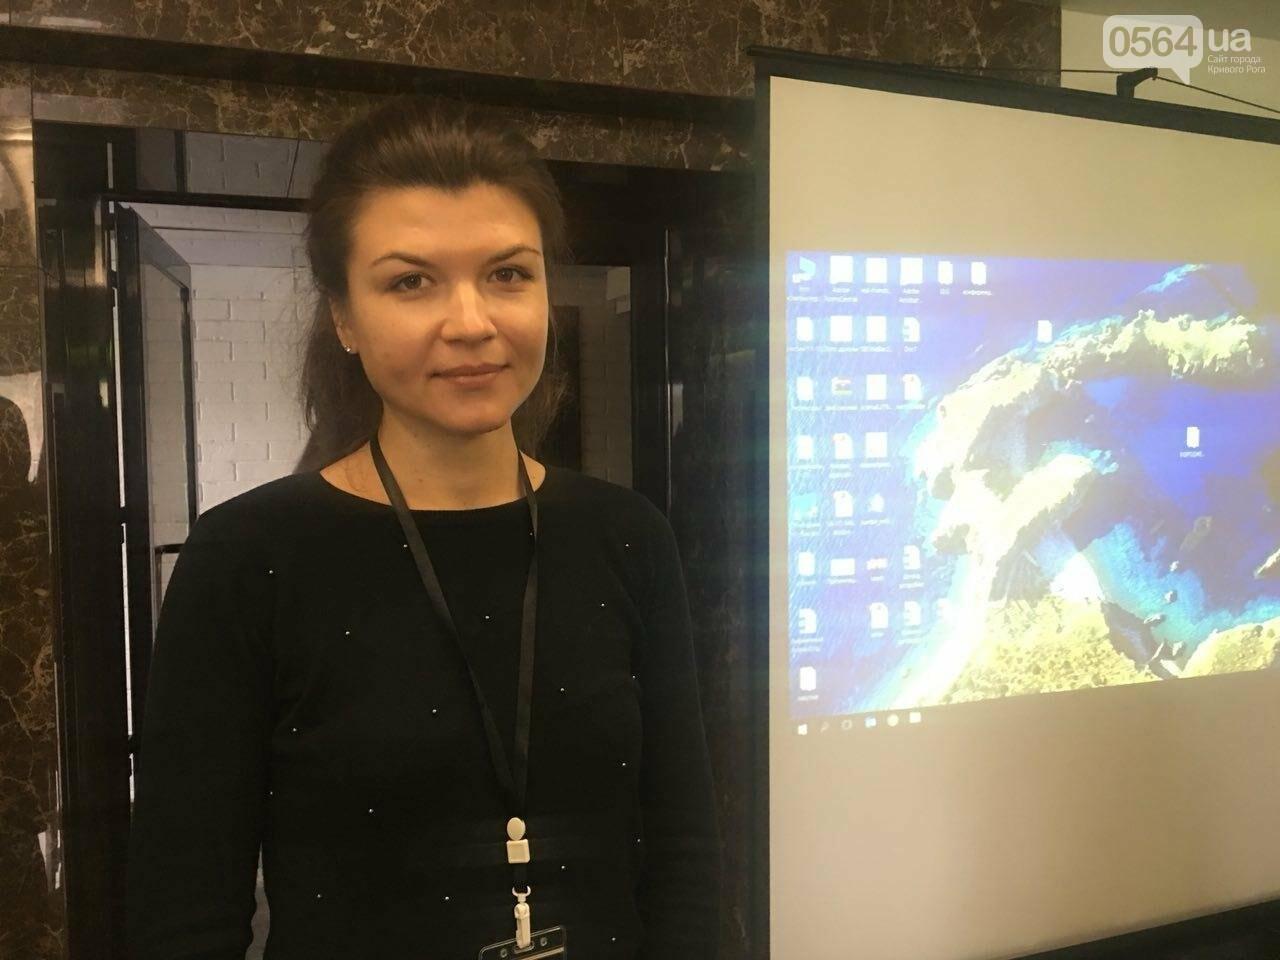 На тренинге о ВИЧ и медреформе криворожским журналистам рассказали о дискриминации и стереотипах, - ФОТО , фото-4